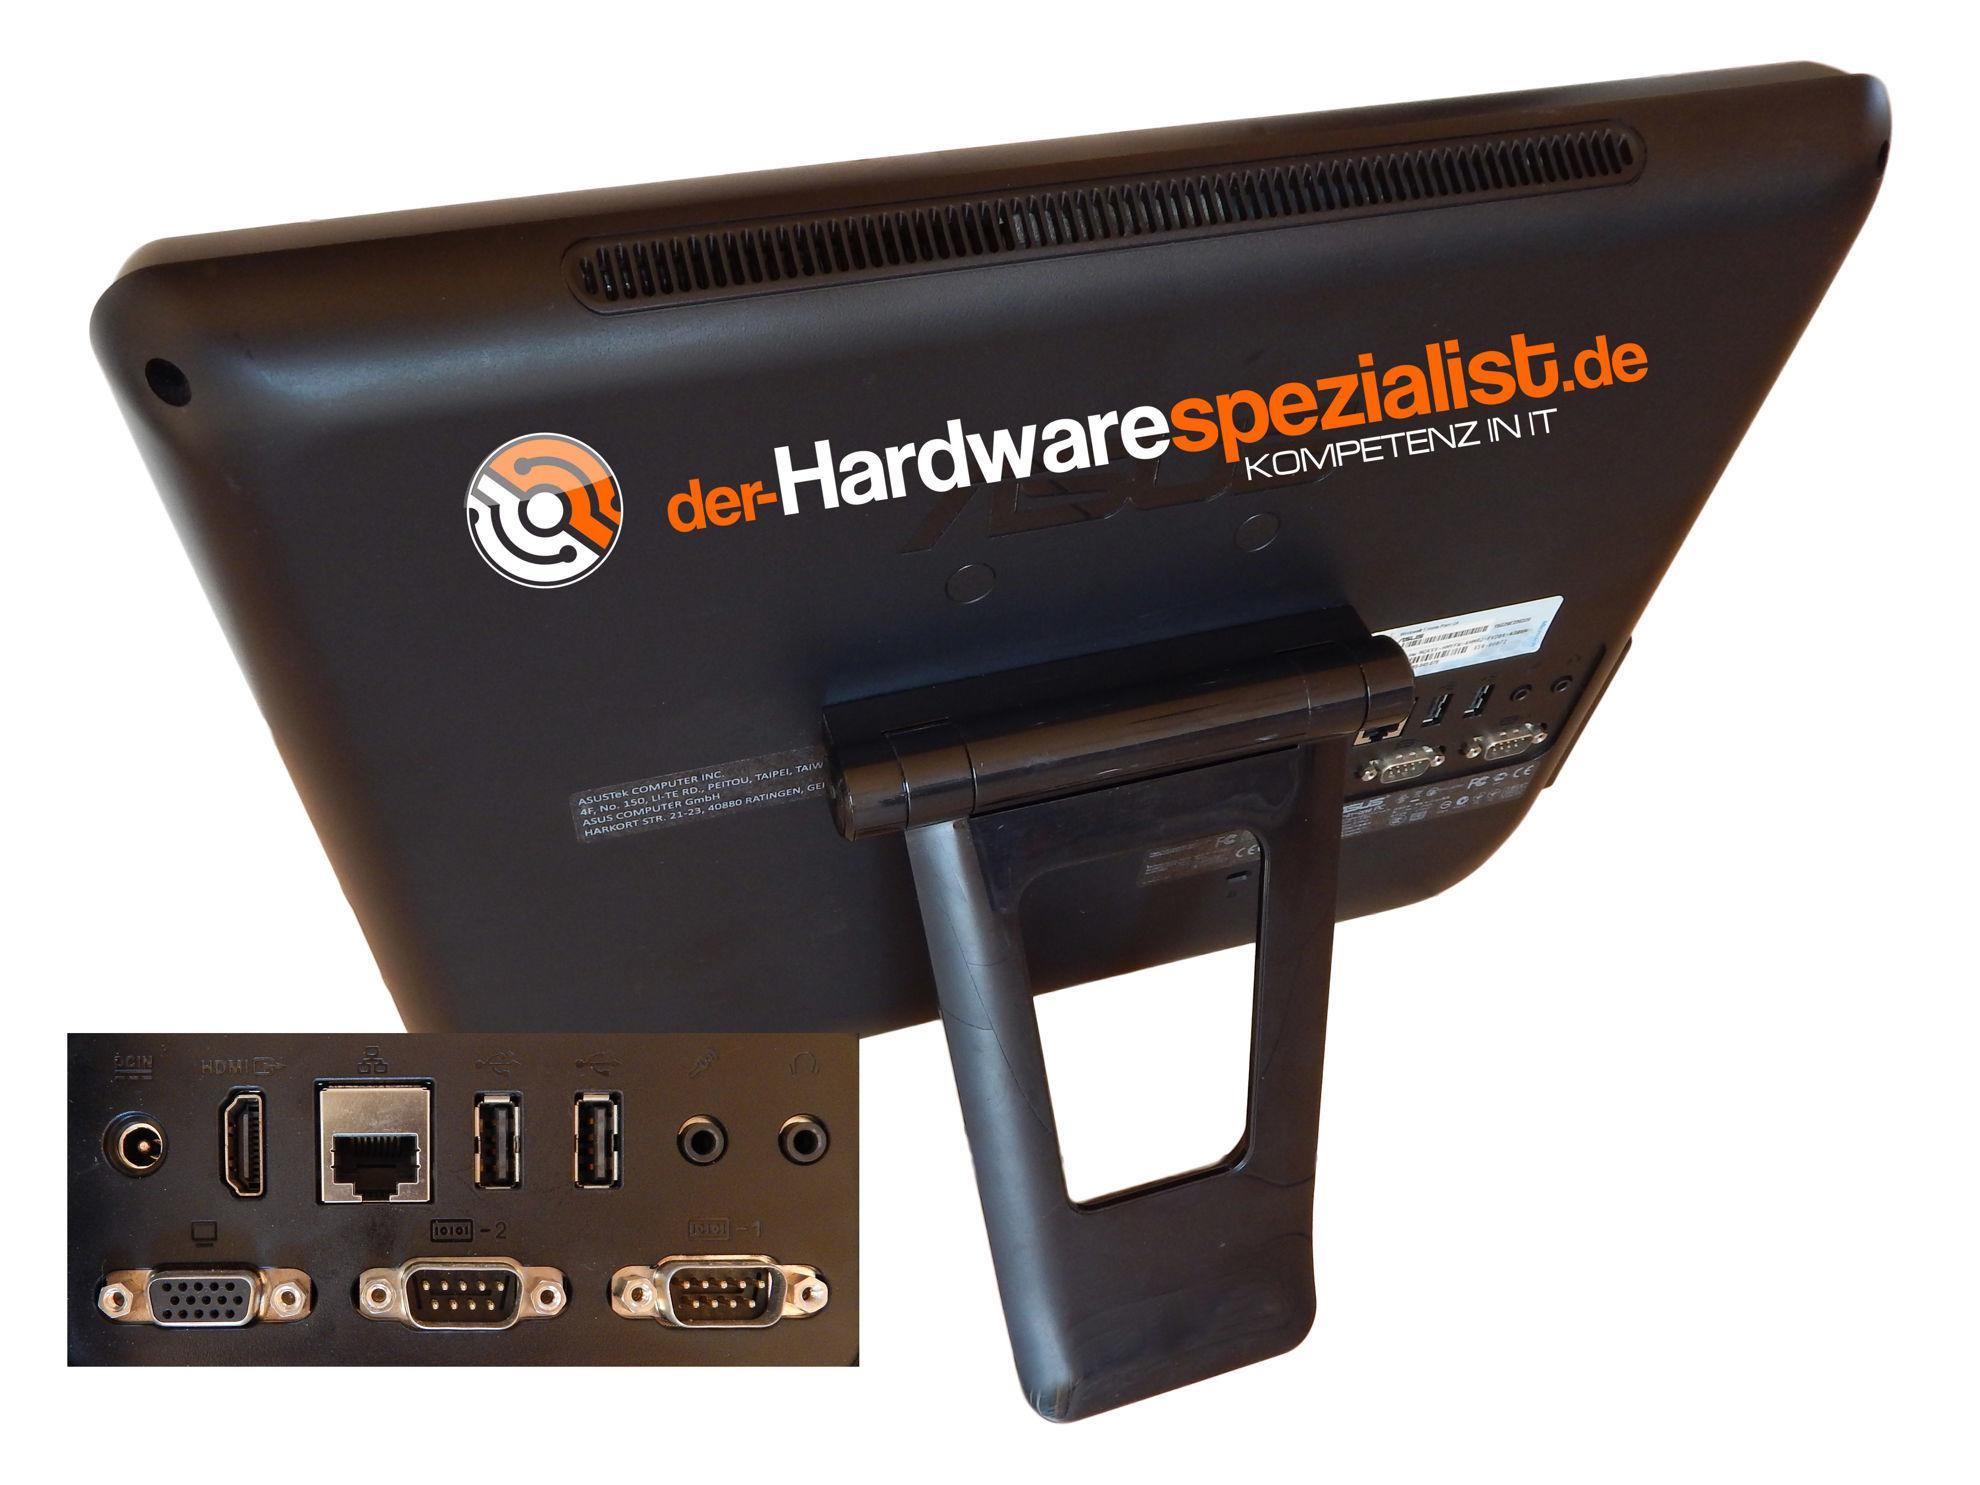 Bild von Asus EeeTop ET1612IUTS (WIN7 GER+HDD) All in One PC POS TouchComputer Kassensystem (Generalüberholt)